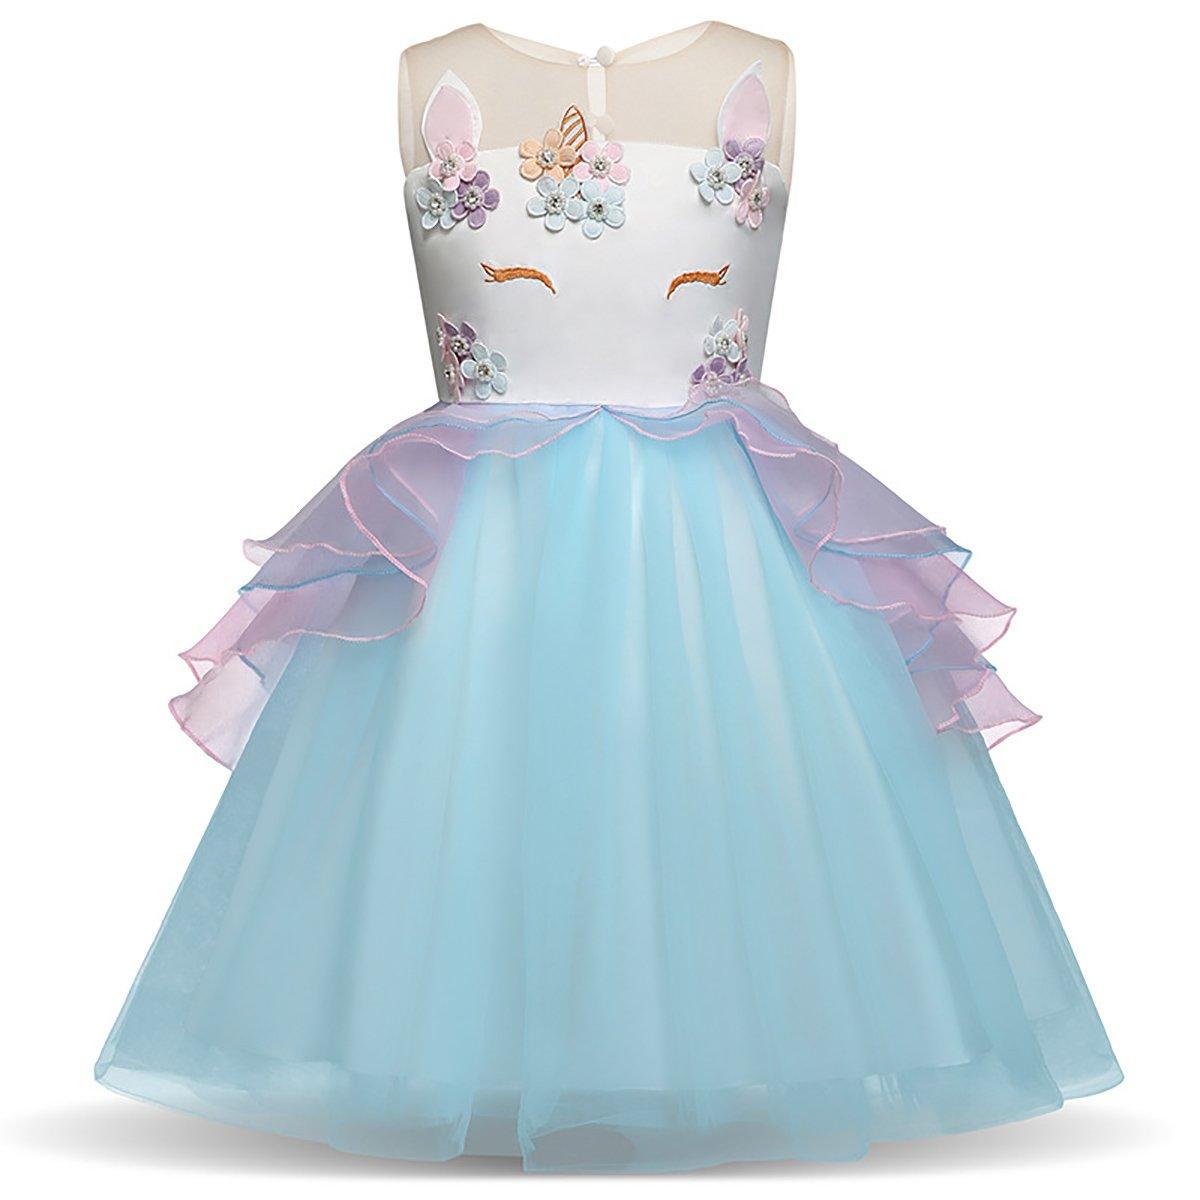 Little.Elf Unicorn Costume Dress Pageant Party Dresses Flower Evening Gowns